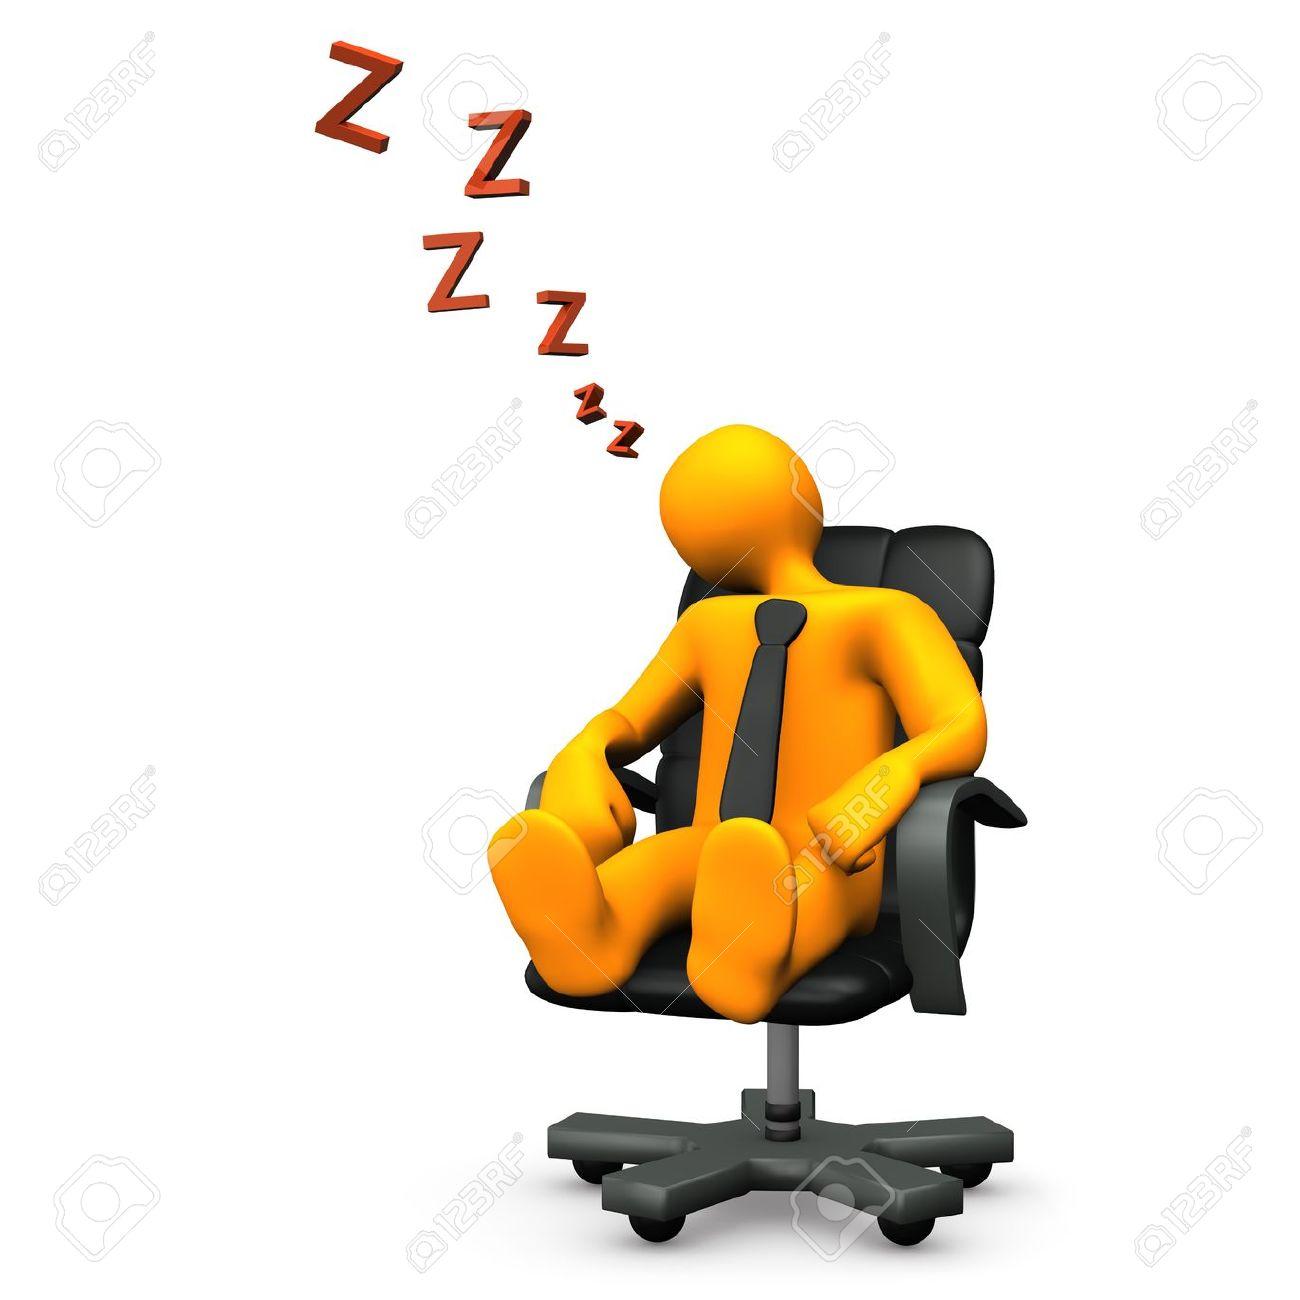 Orange cartoon character has fallen asleep on the swivel armchair. Stock Photo - 12020164